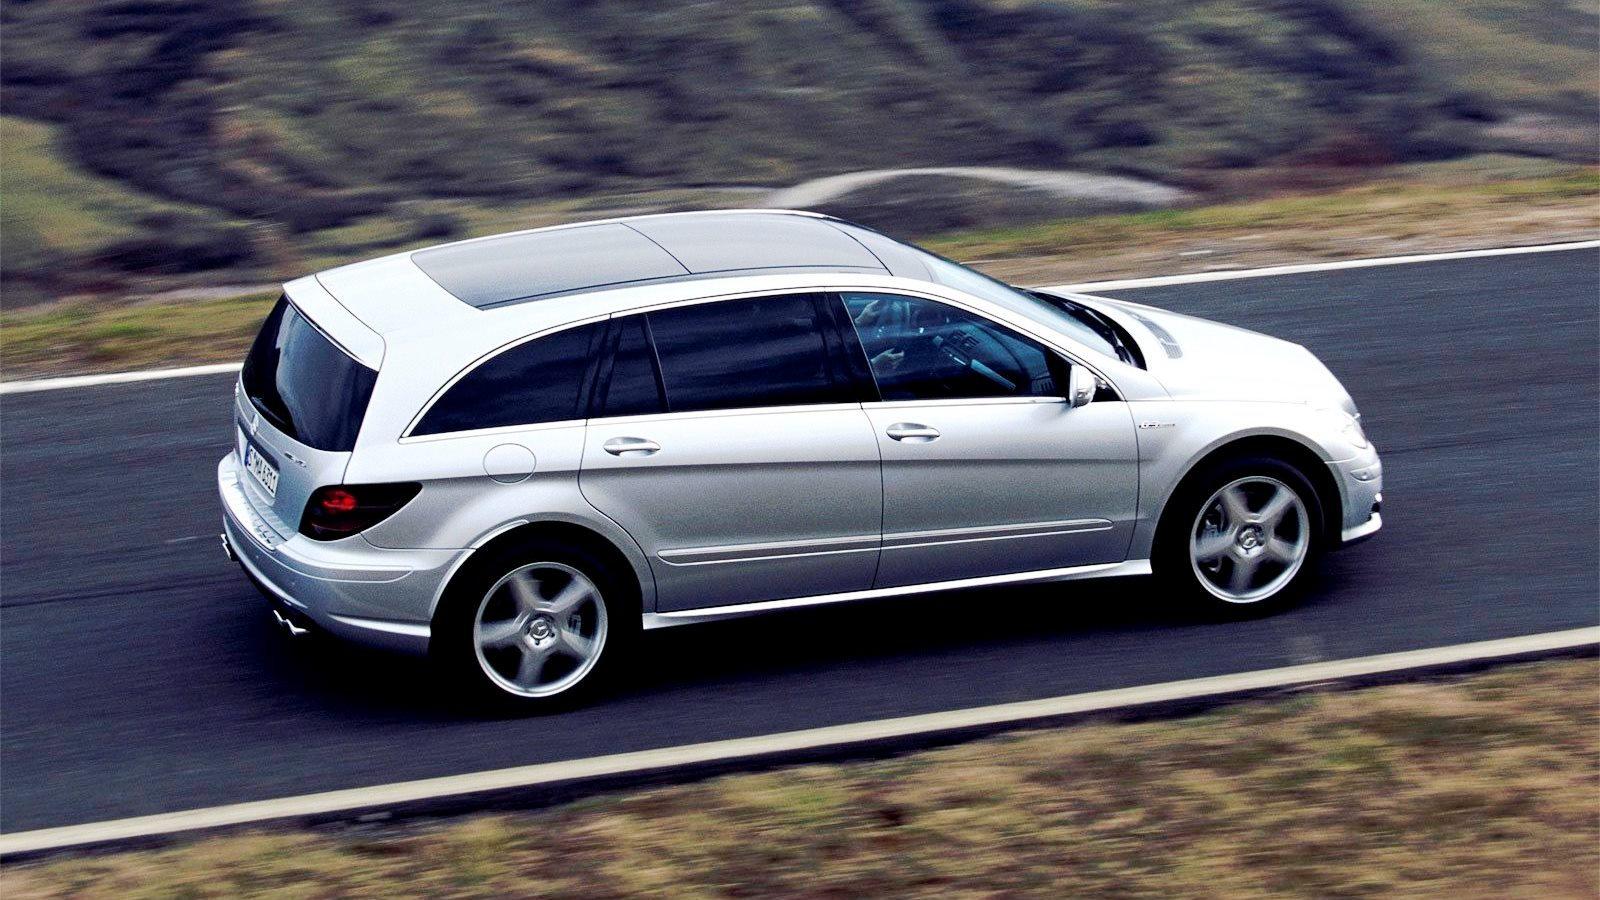 Mercedes-Benz W251 R63 AMG Minivan